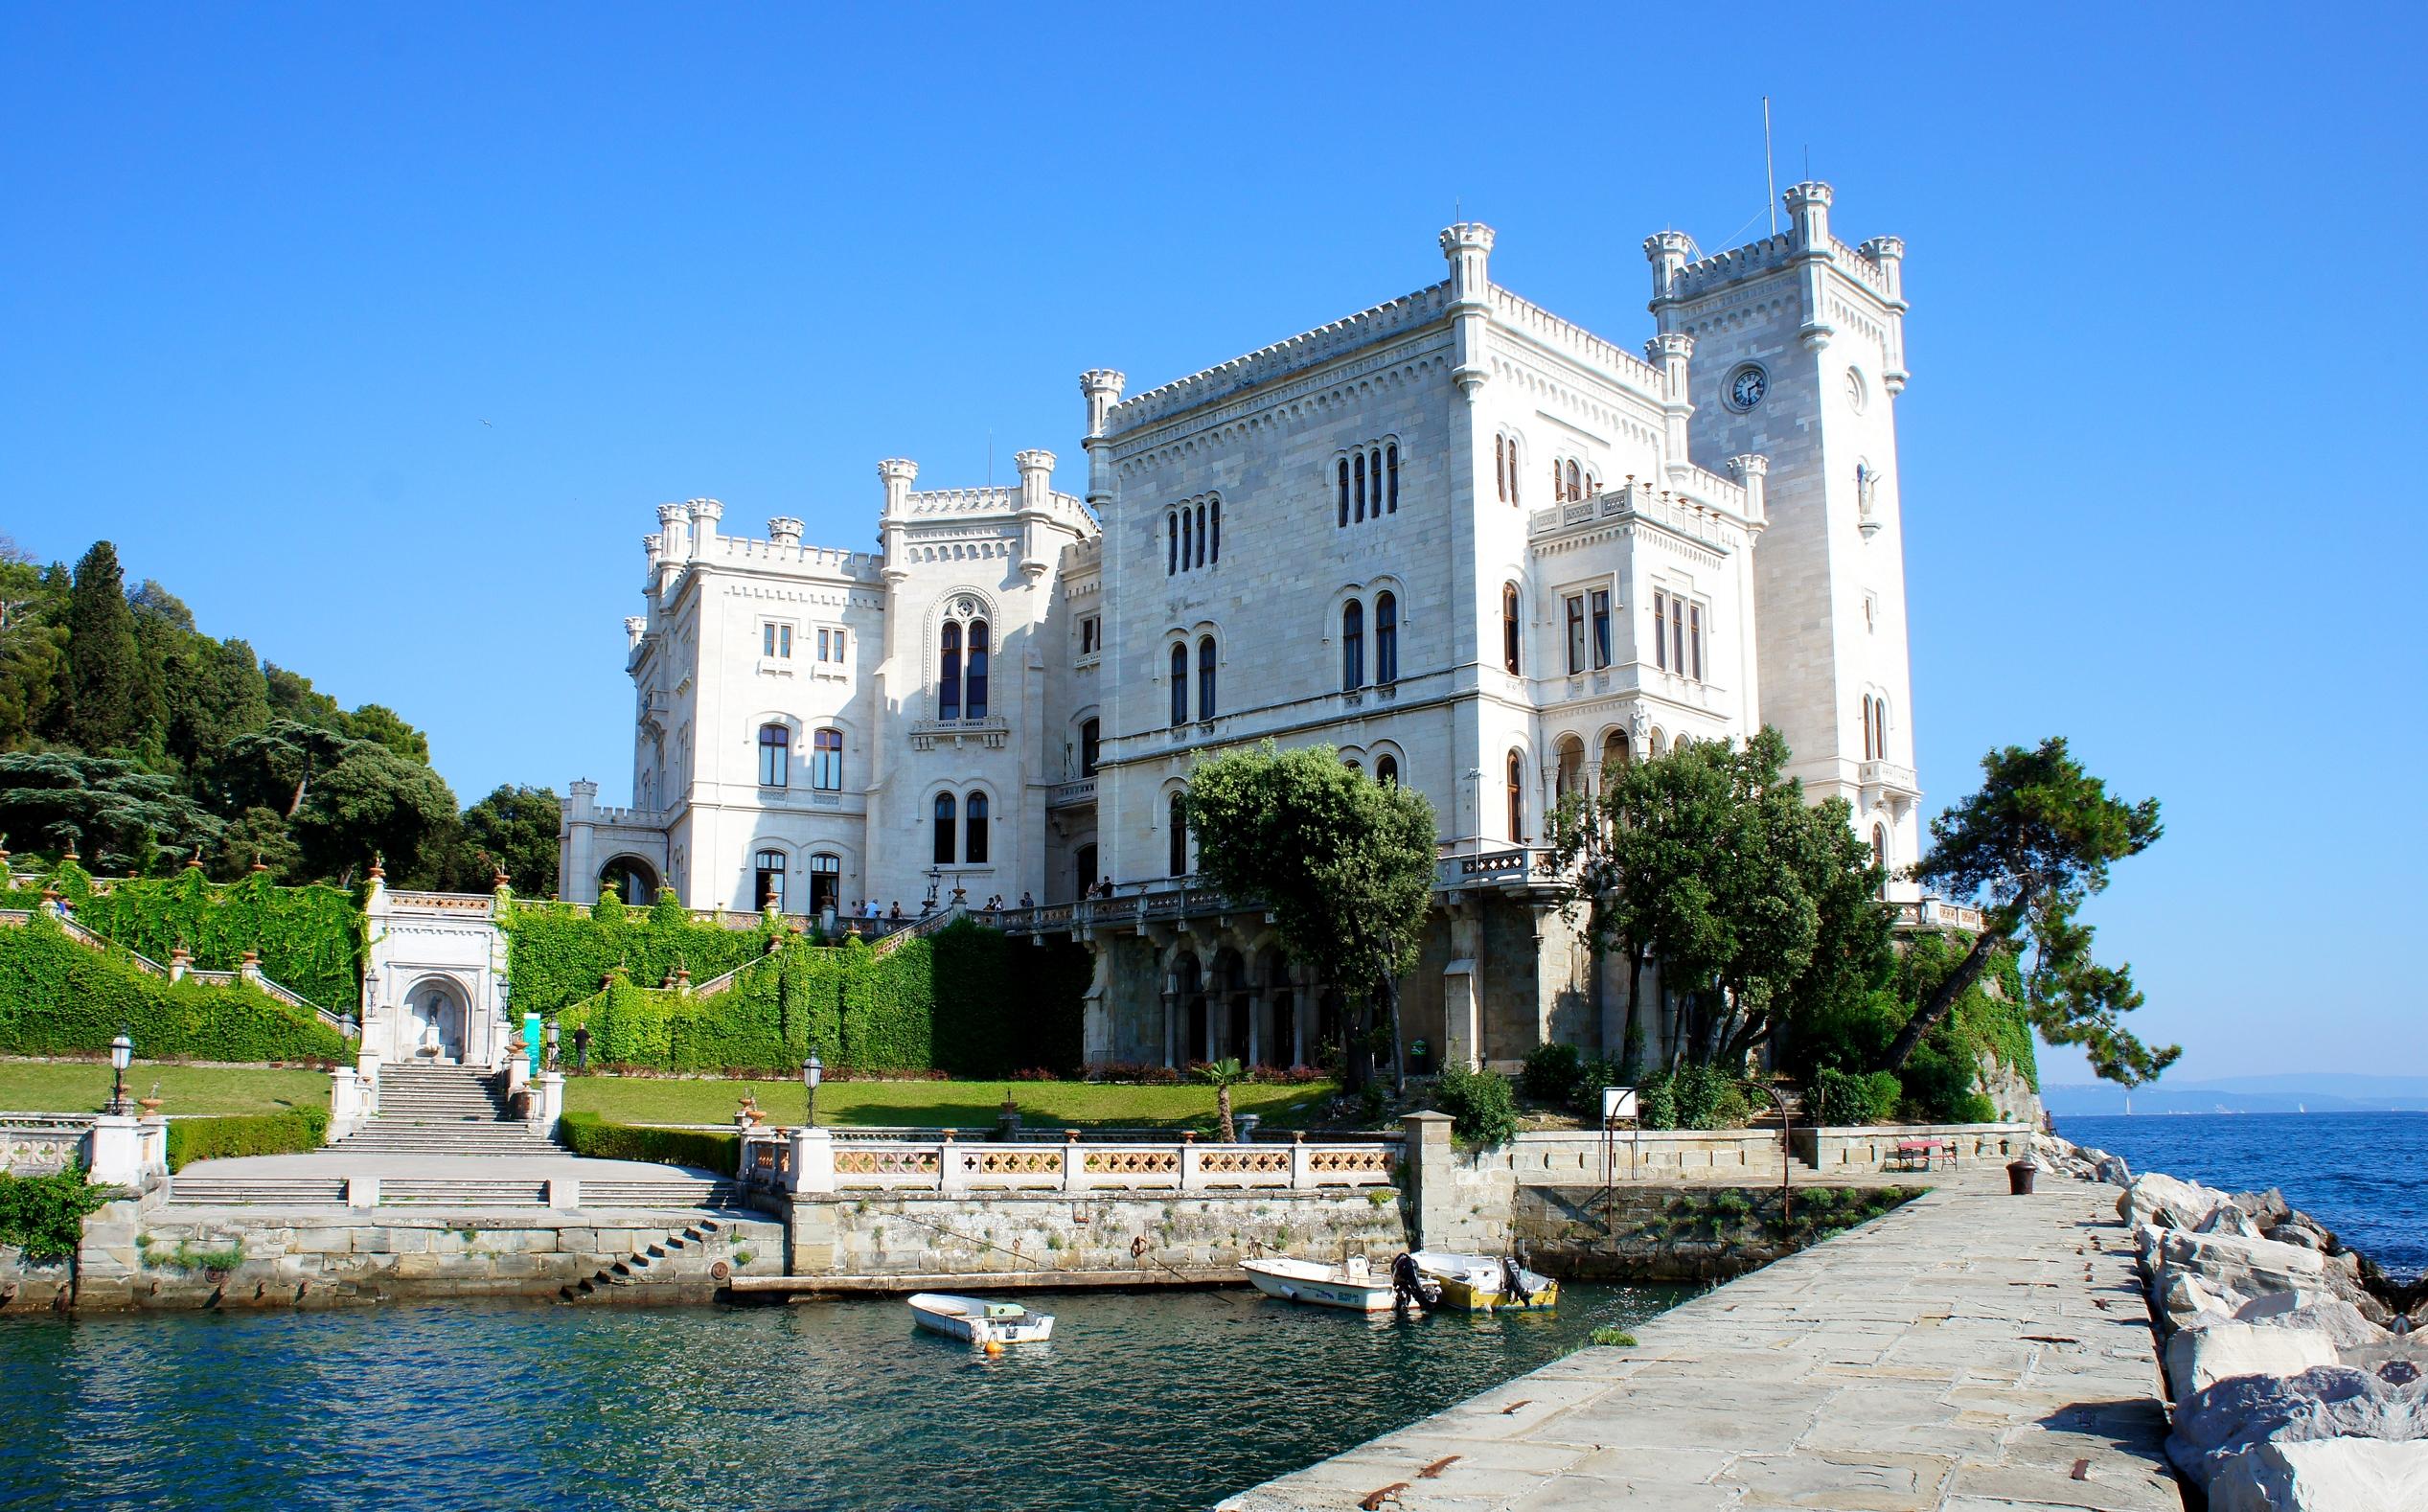 Castello Venezia Hotel